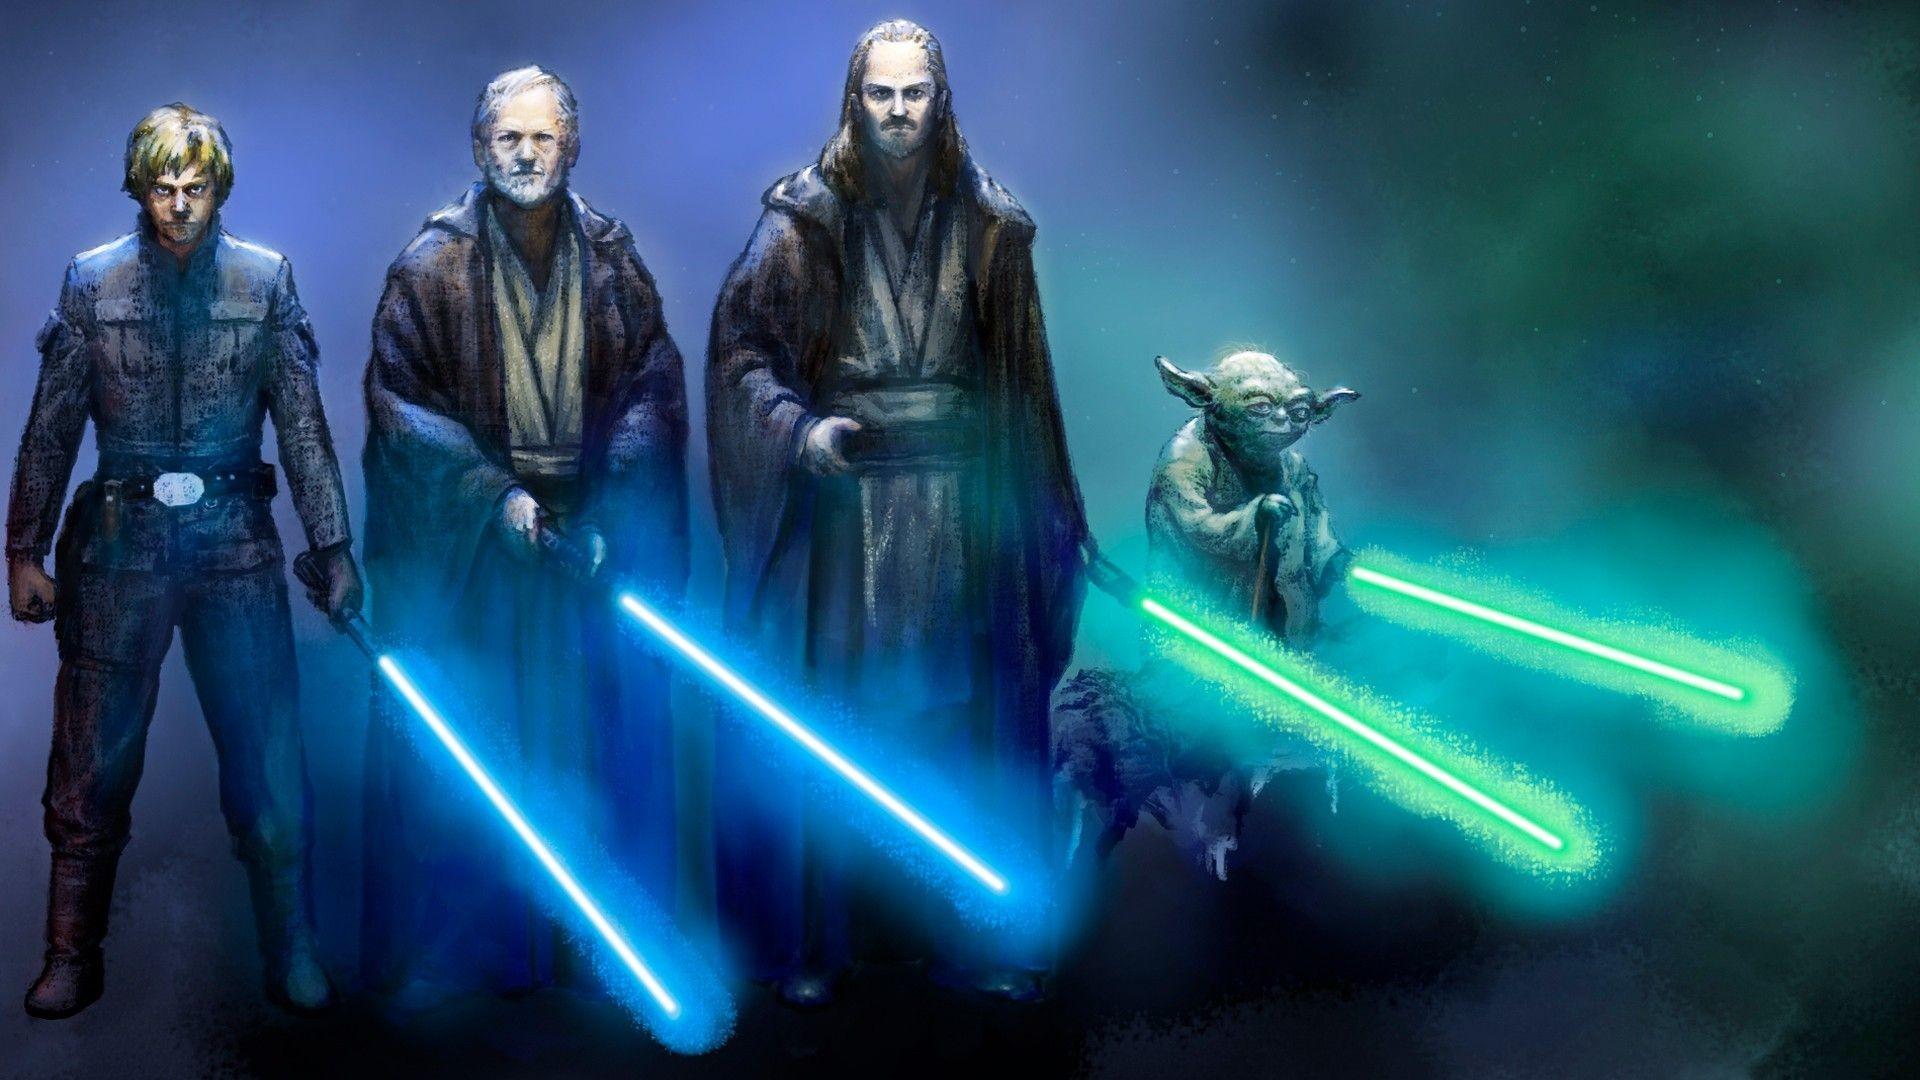 Star Wars Christmas Wallpaper (67+ images)